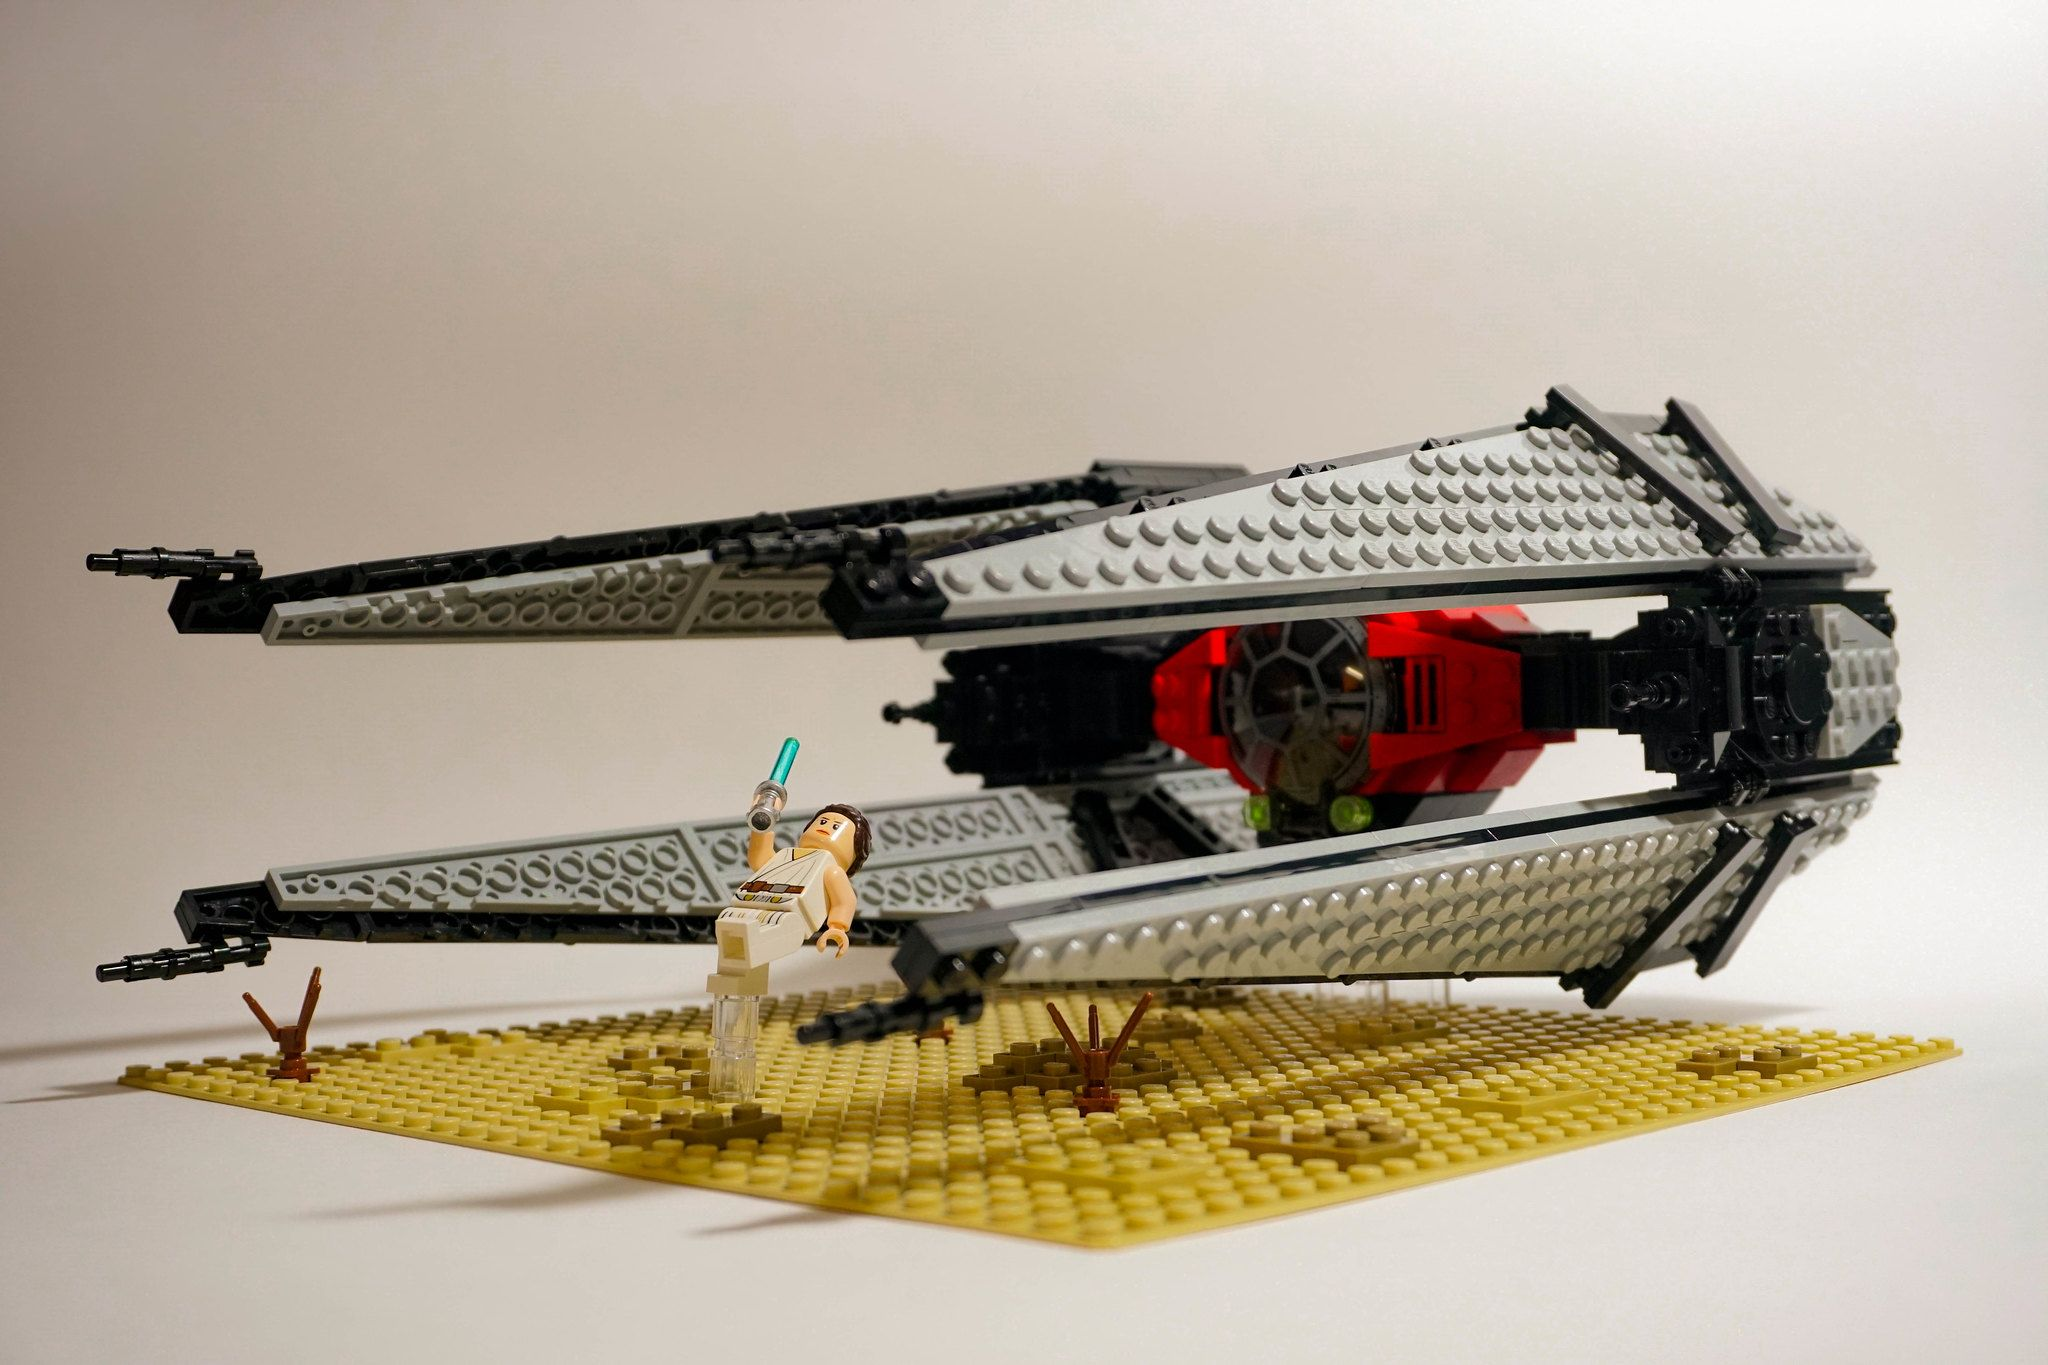 The Rise Of Skywalker Lego Star Wars Skywalker Star Wars